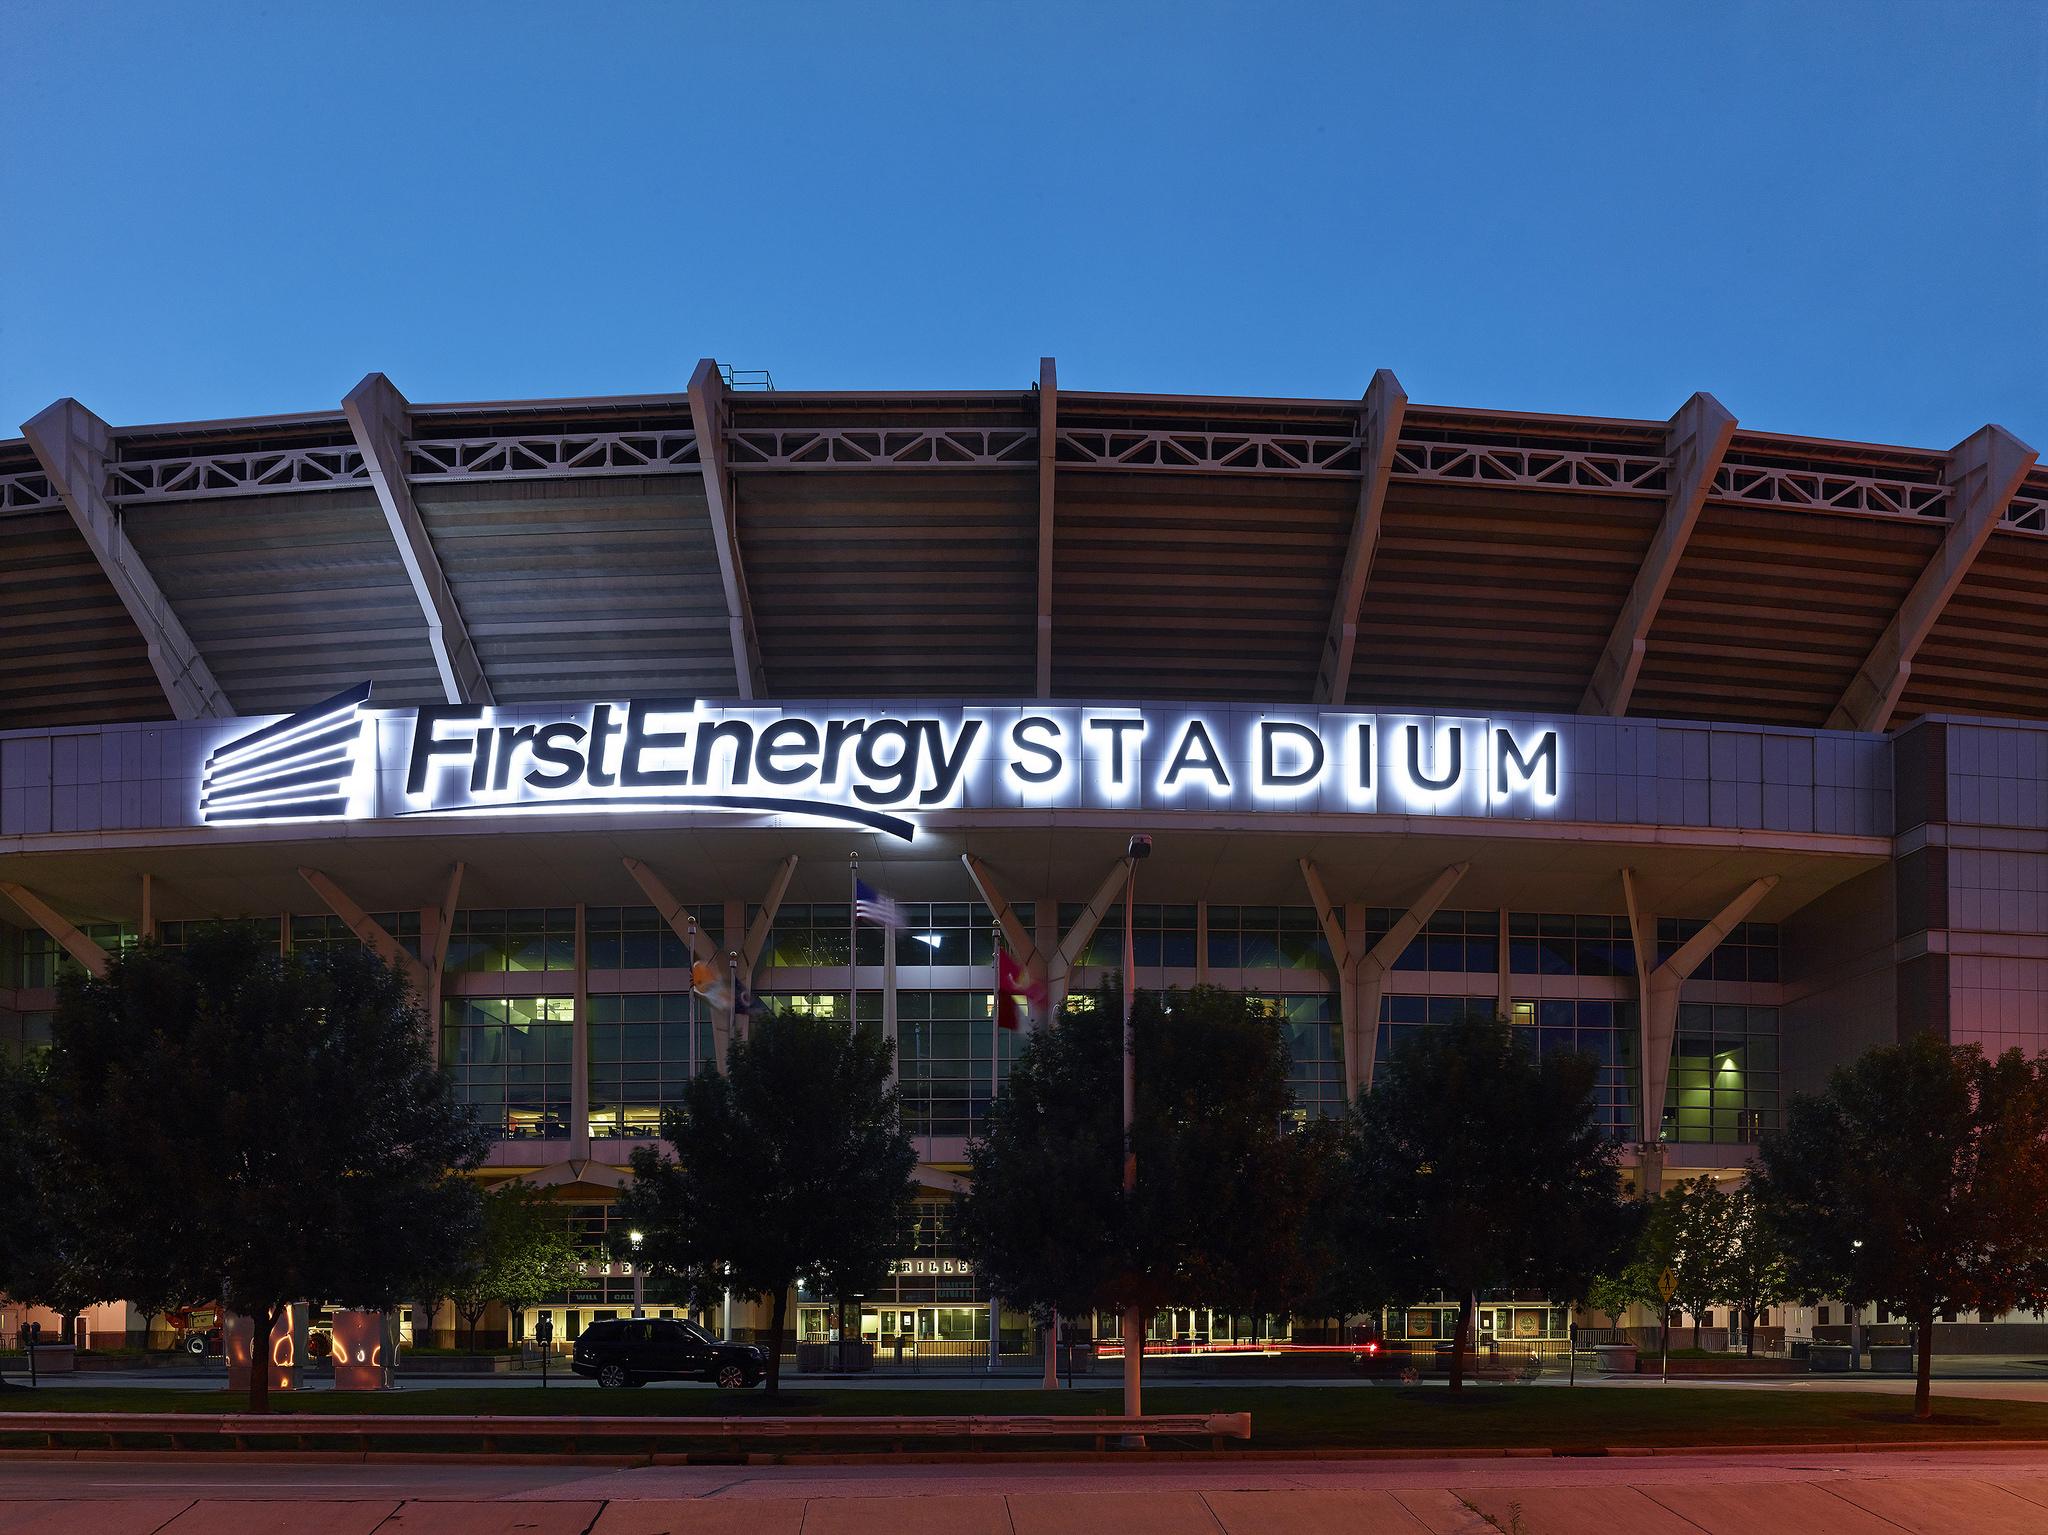 FirstEnergy Stadium